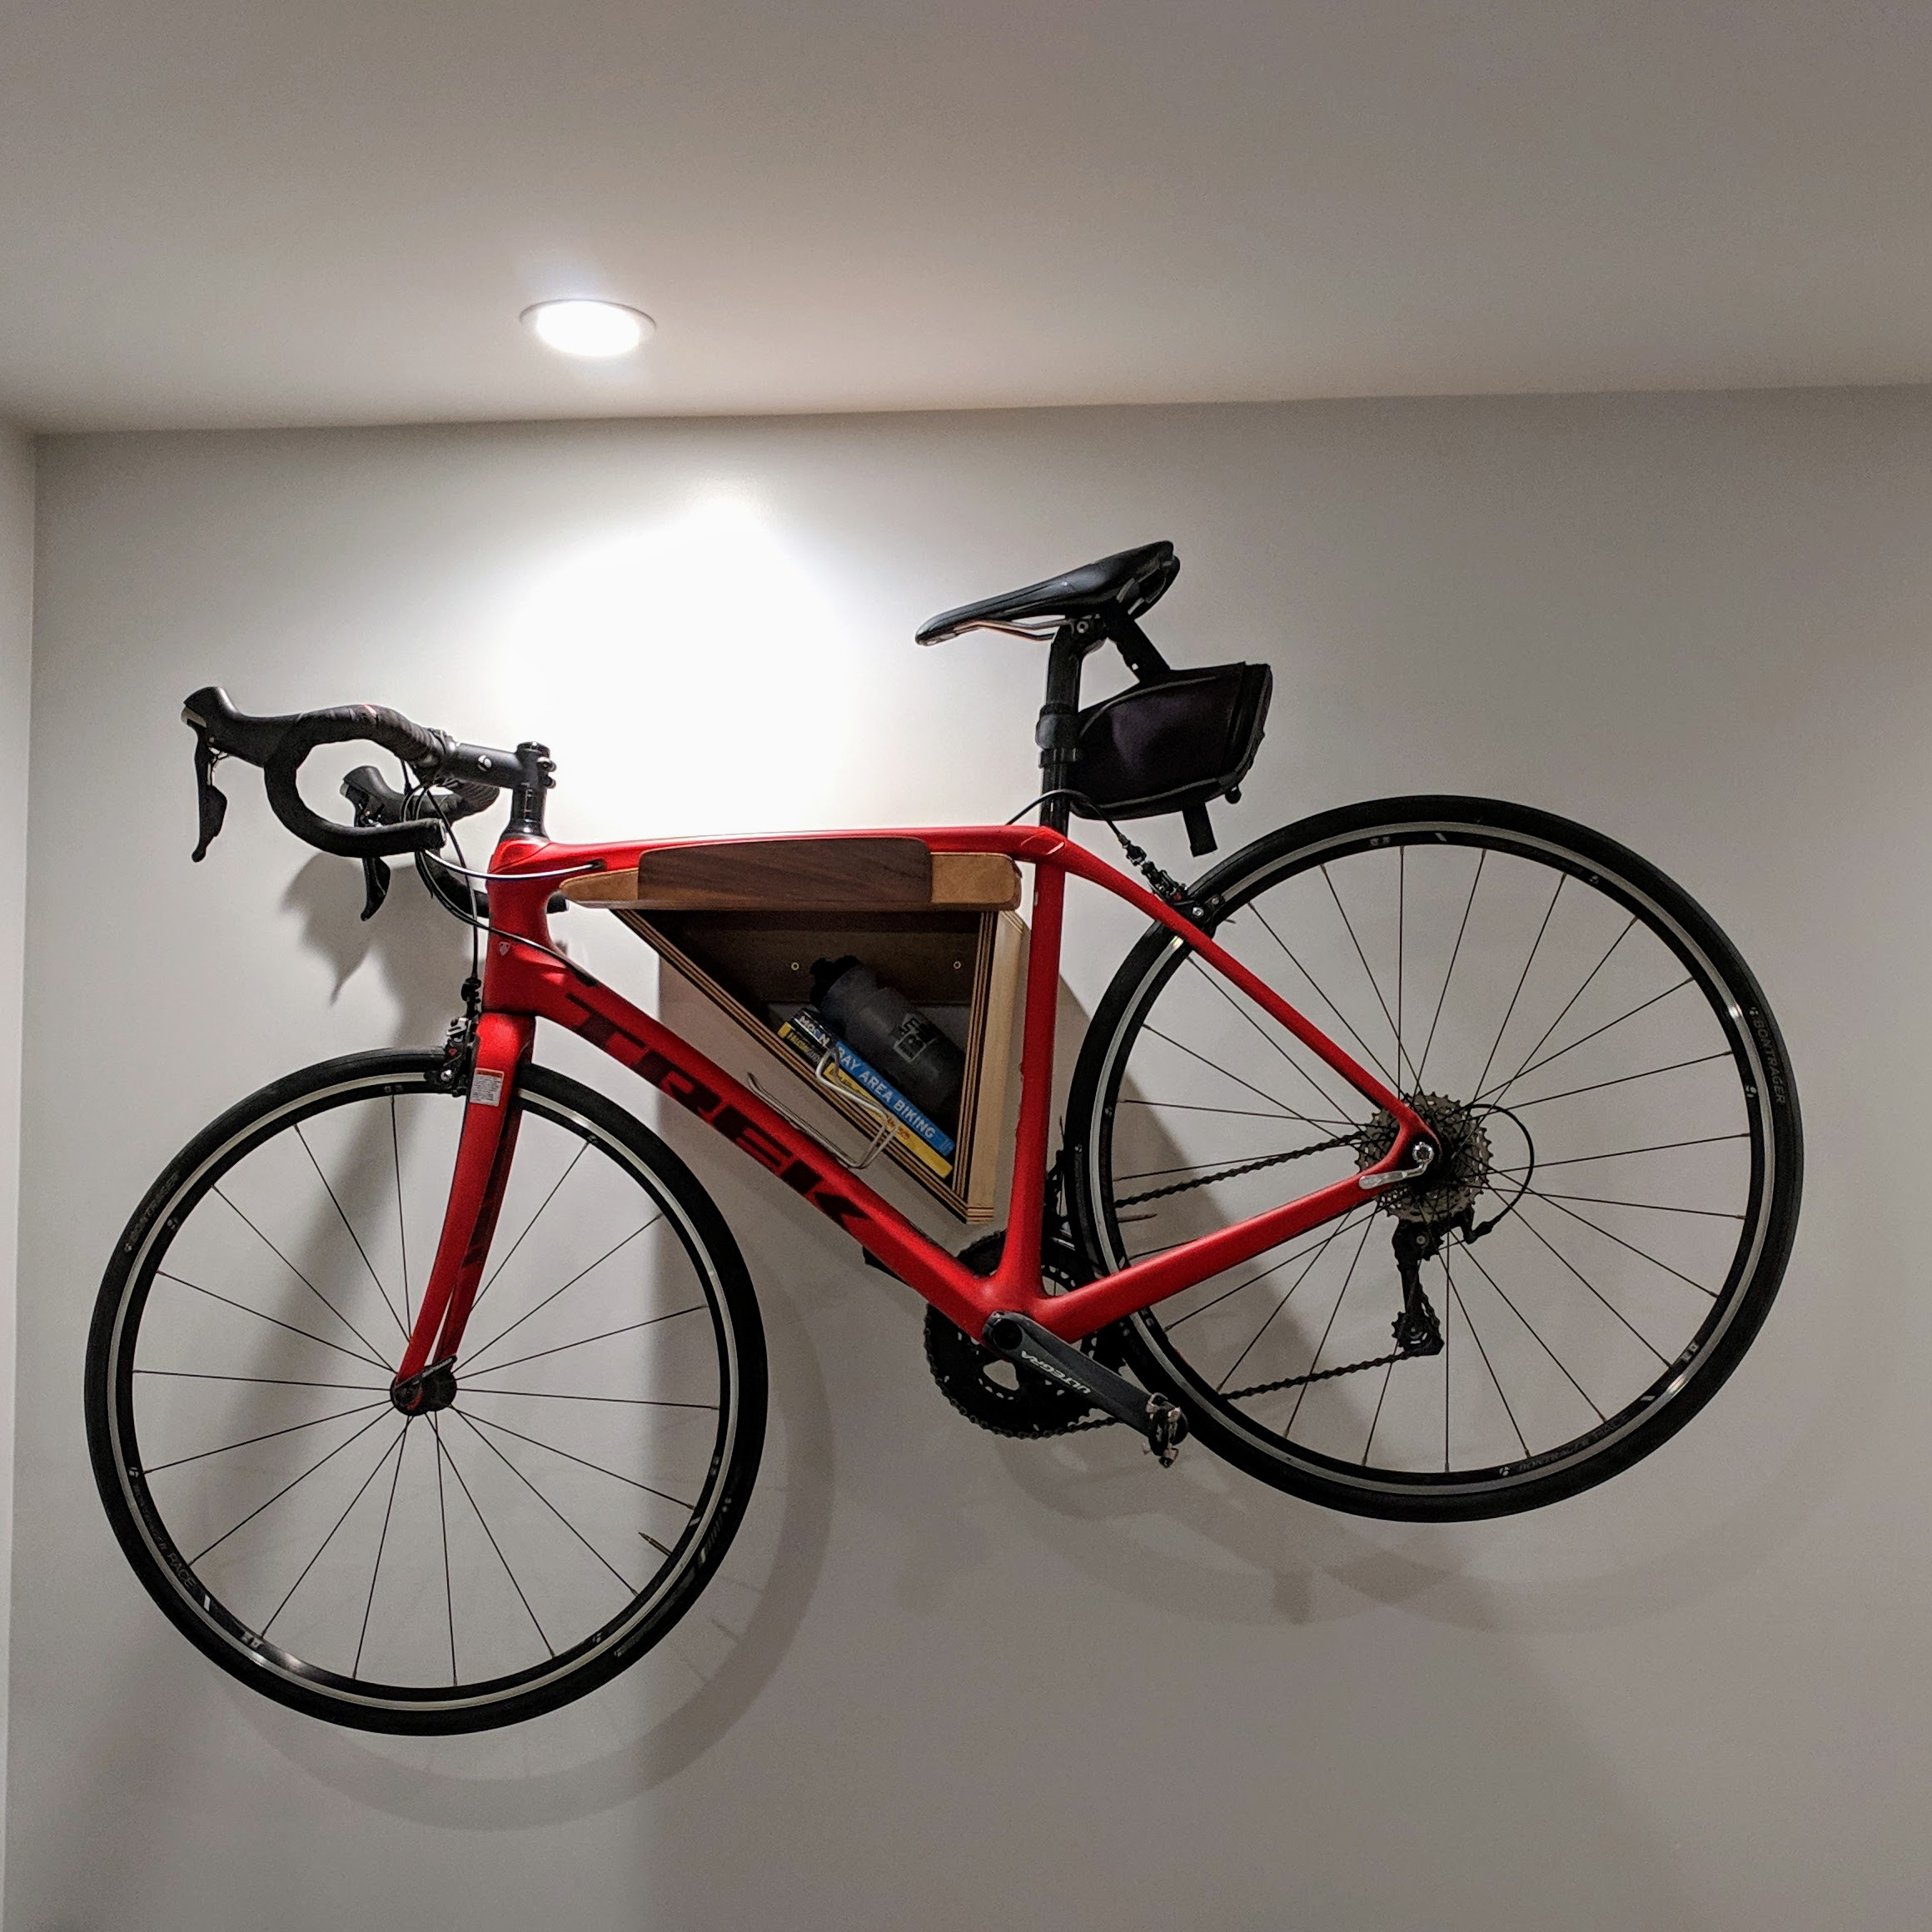 Creative Bicycle Storage -